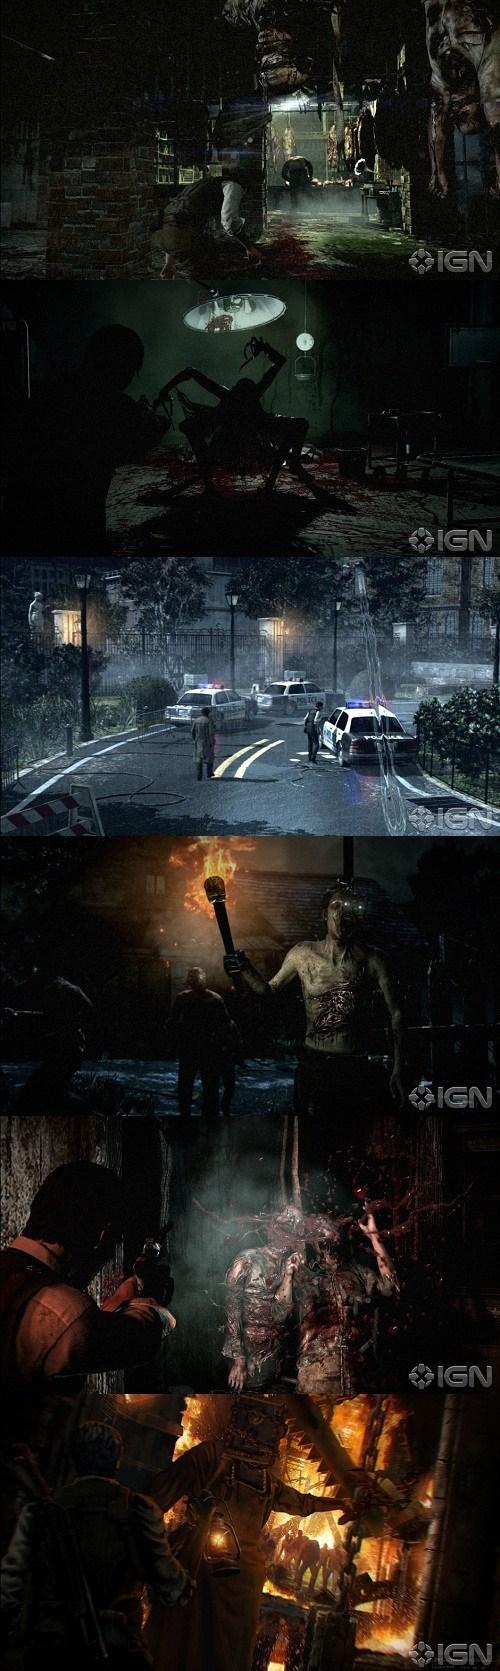 news the evil within bethesda IGN screenshots video games shinji mikami - 7360013312